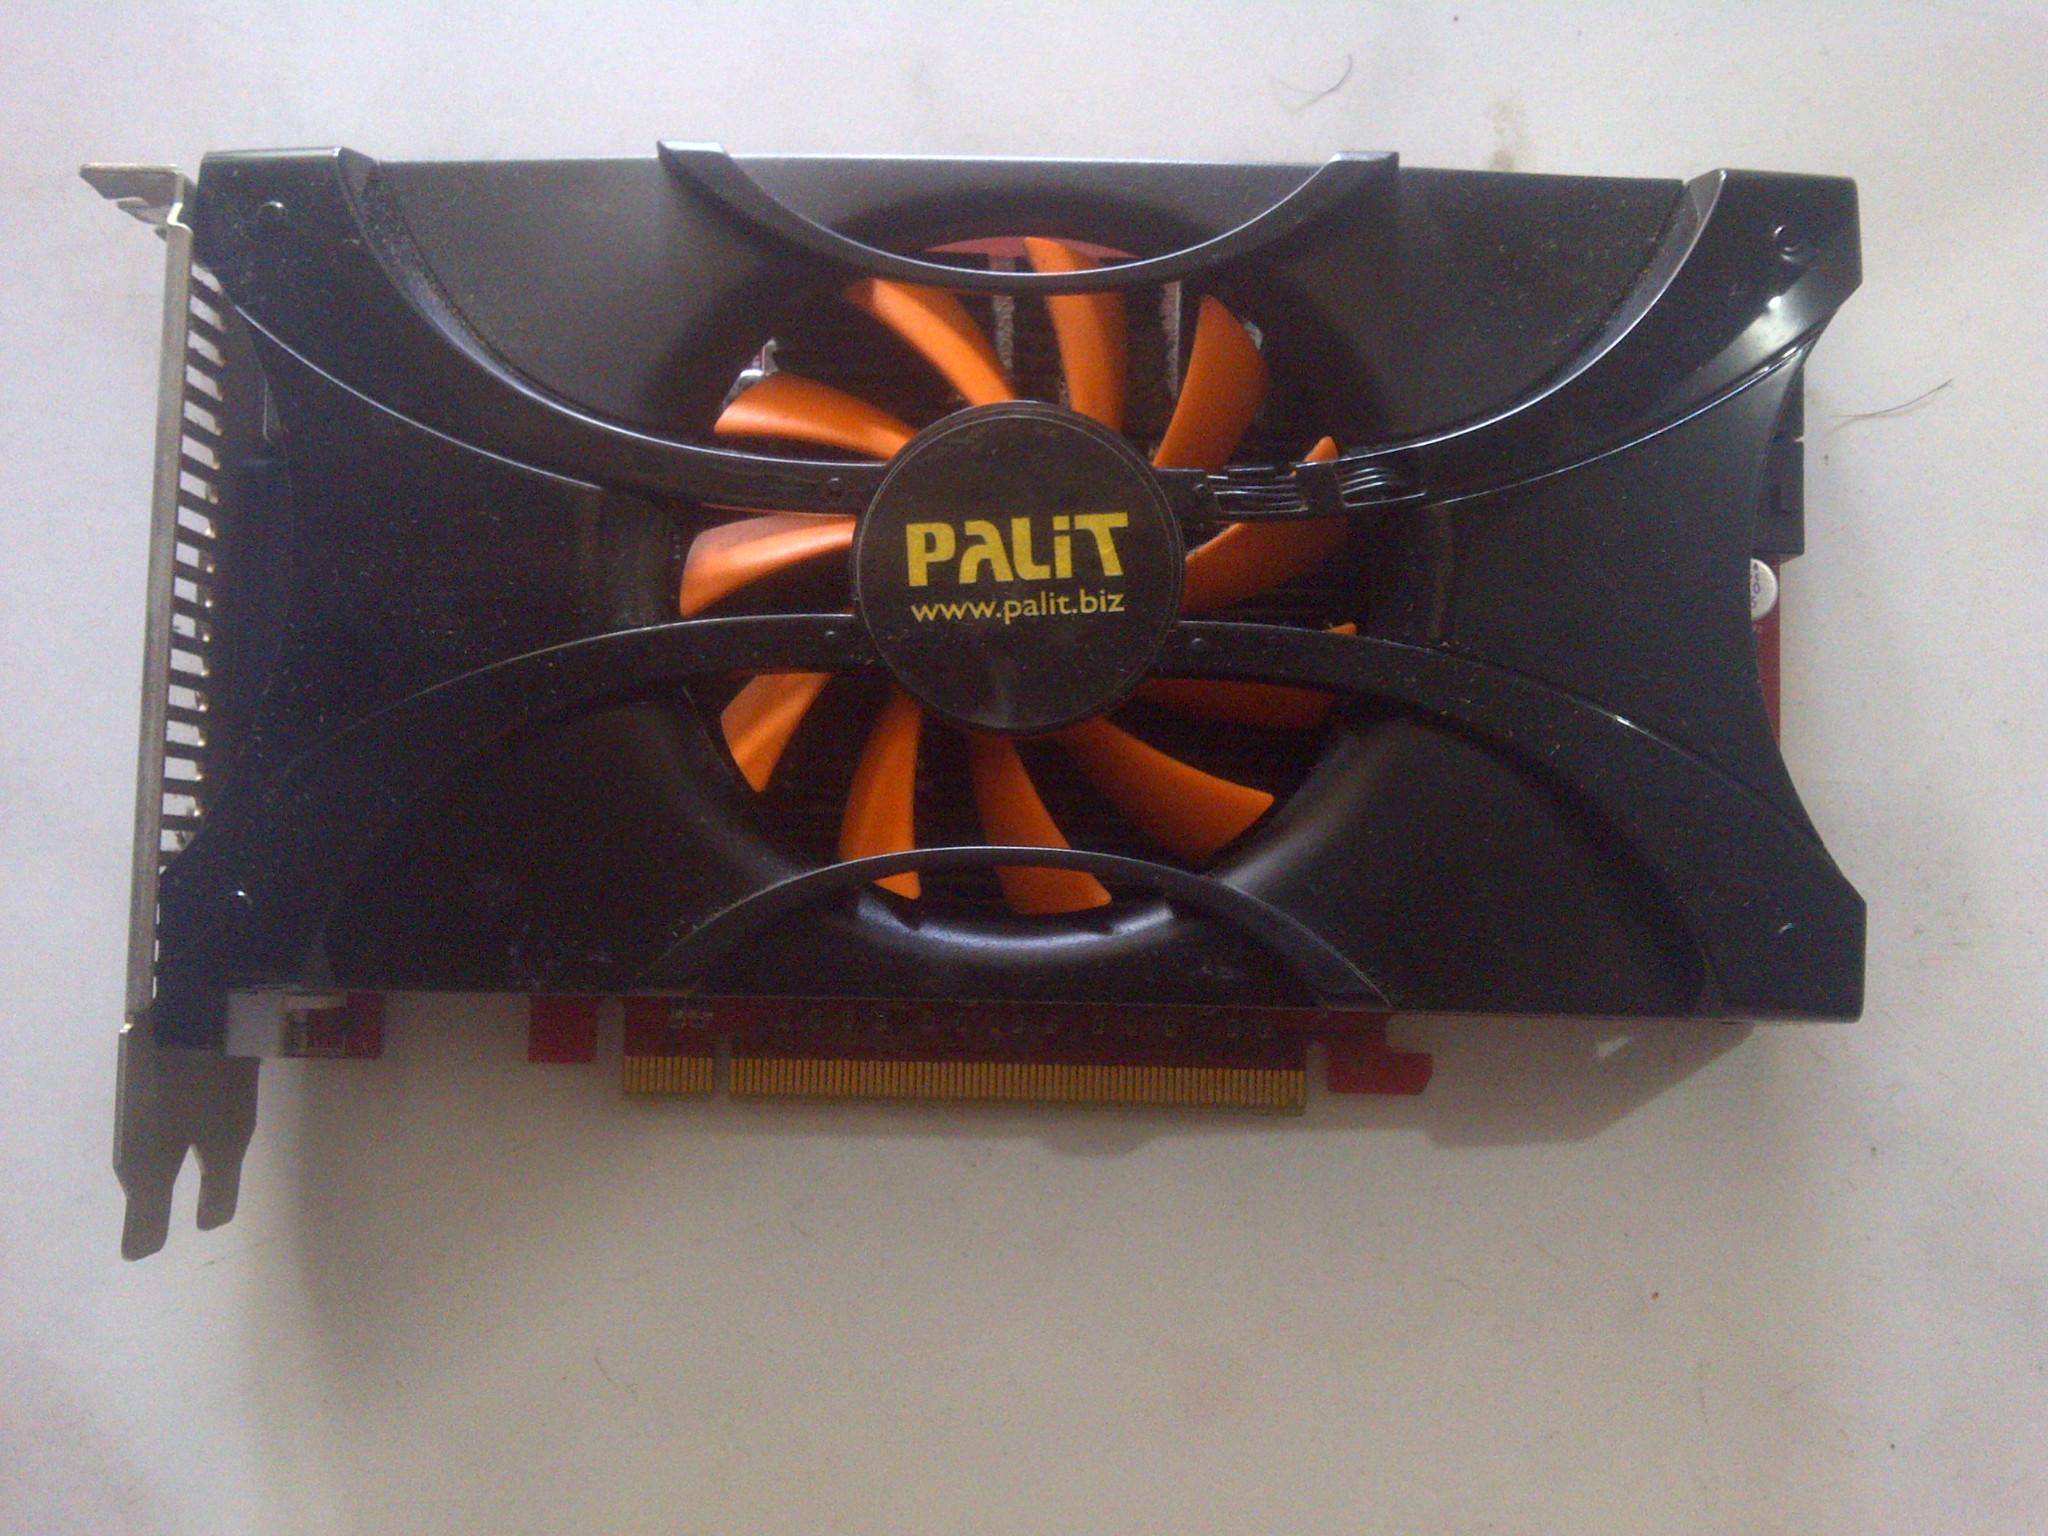 Jual VGA Palit Nvidia GeForce GTX 460 1GB batangan - Kab